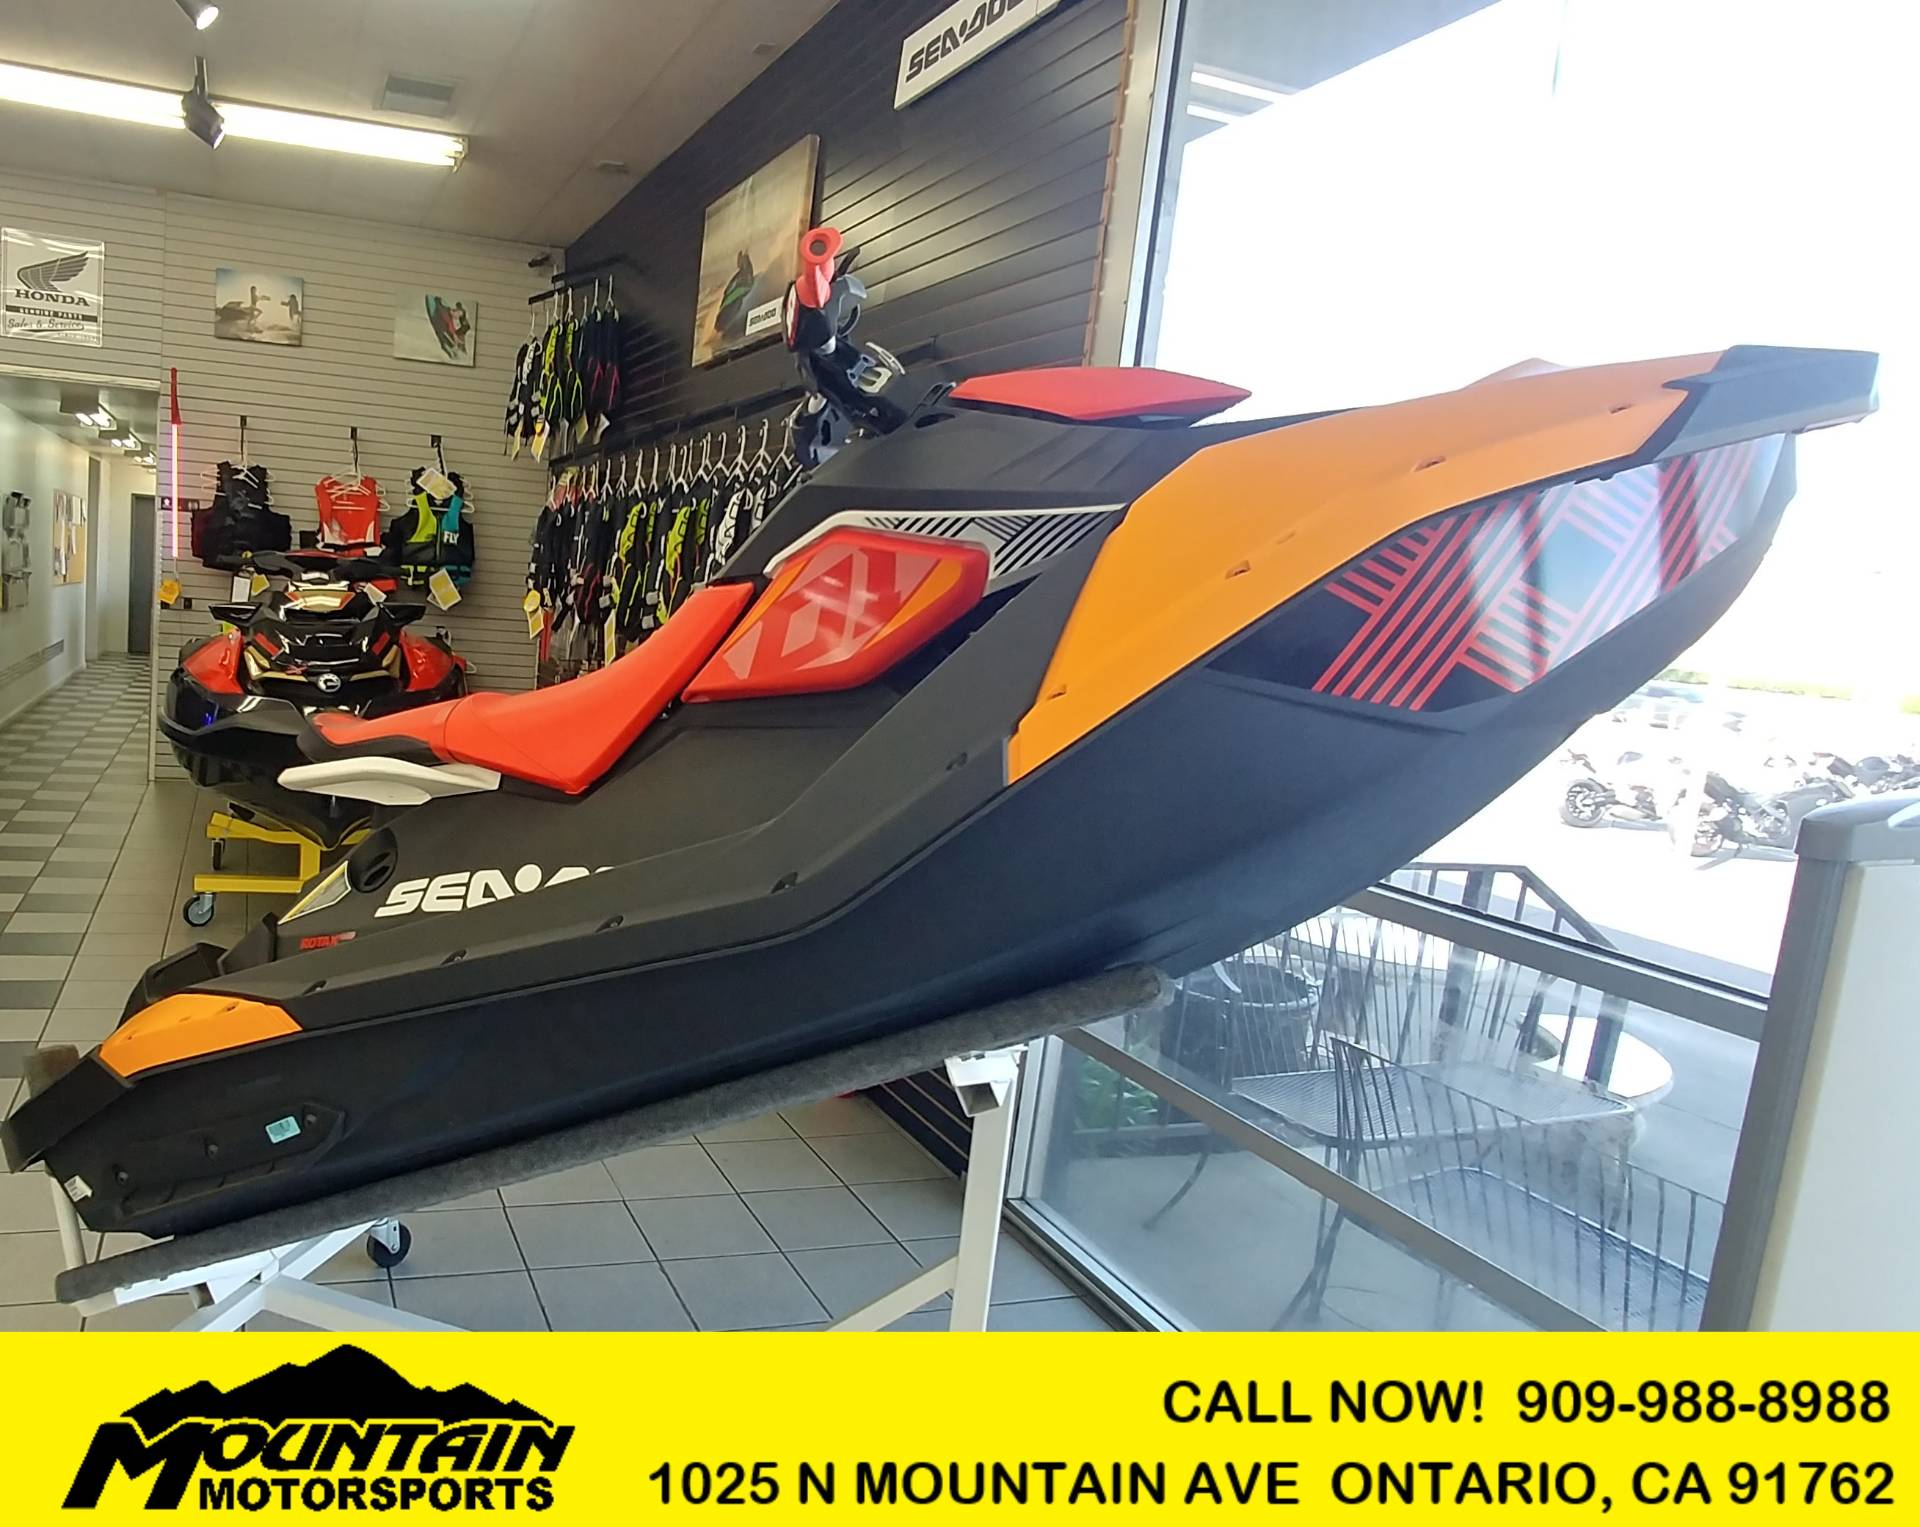 2018 Sea-Doo Spark 2up Trixx iBR for sale 52825